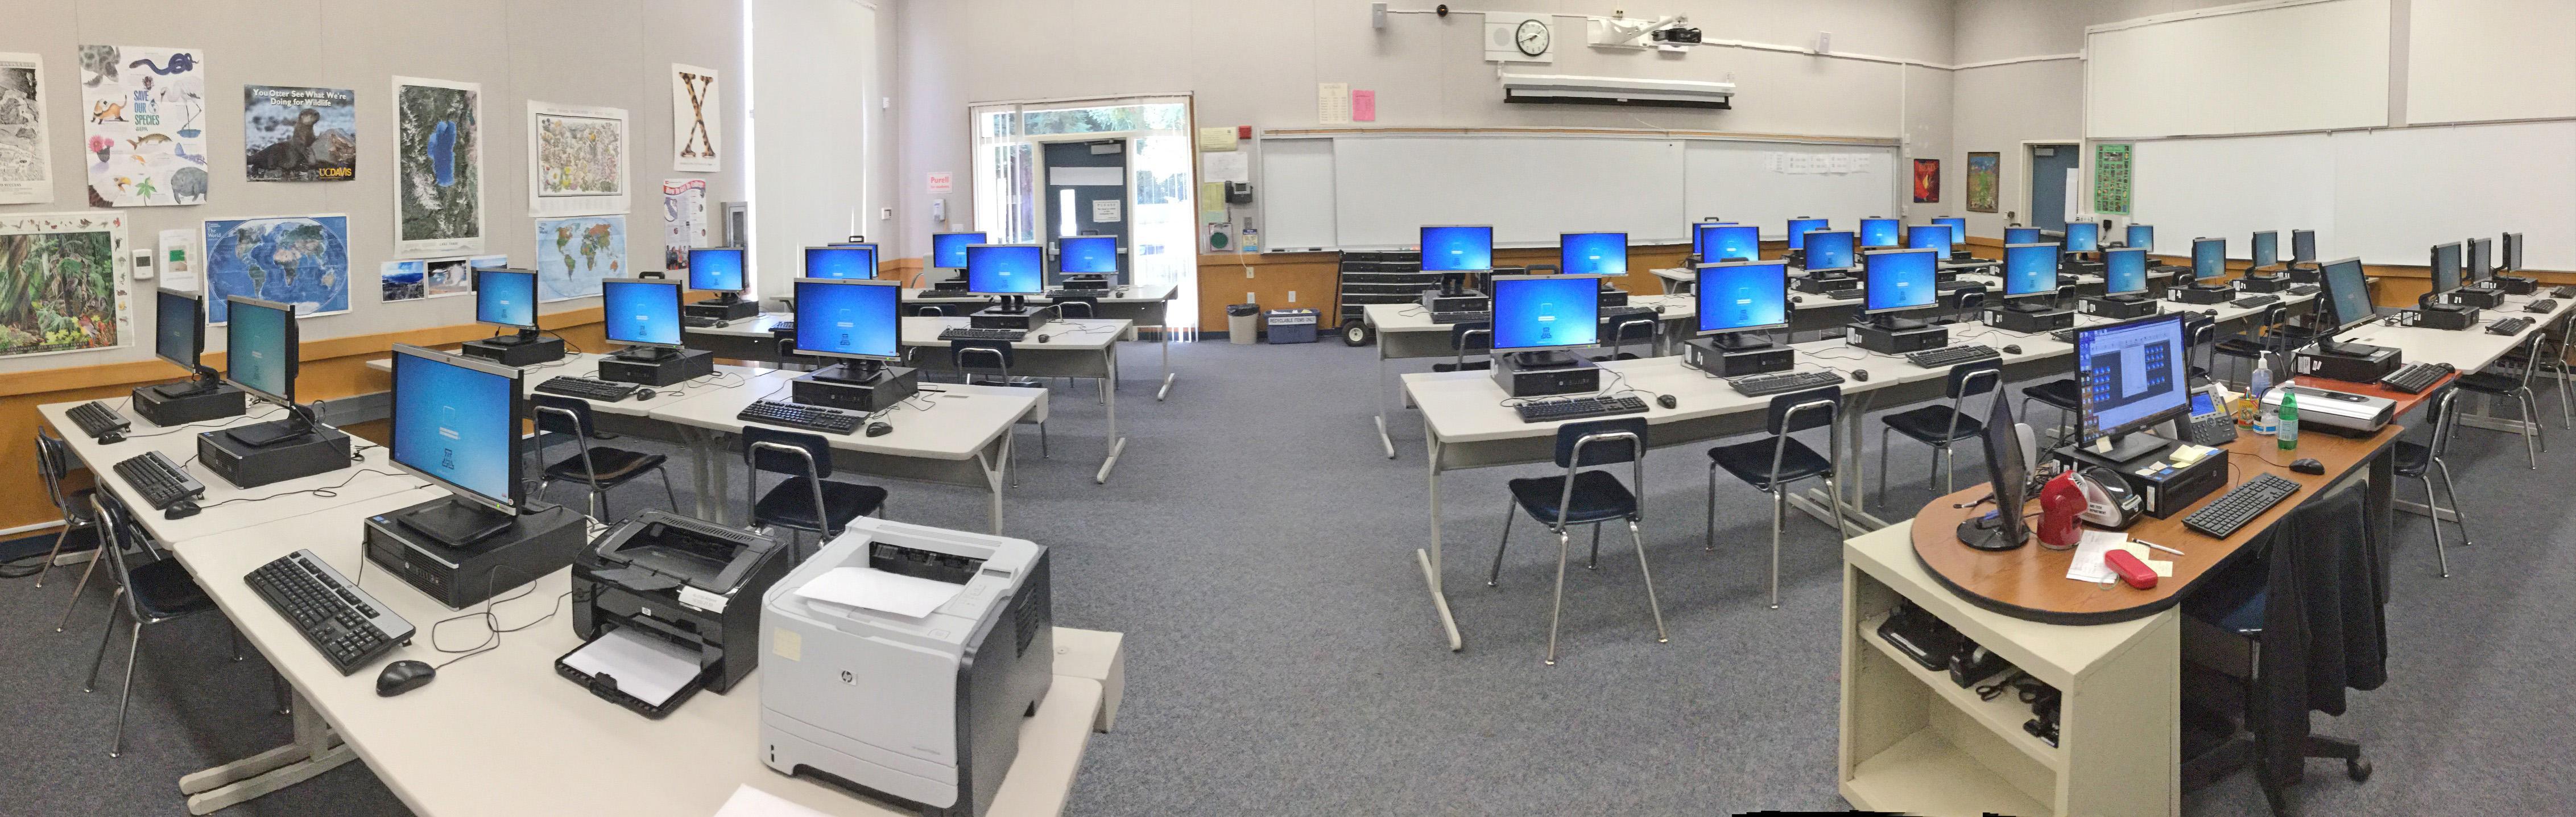 staff computer lab use 316 computer lab